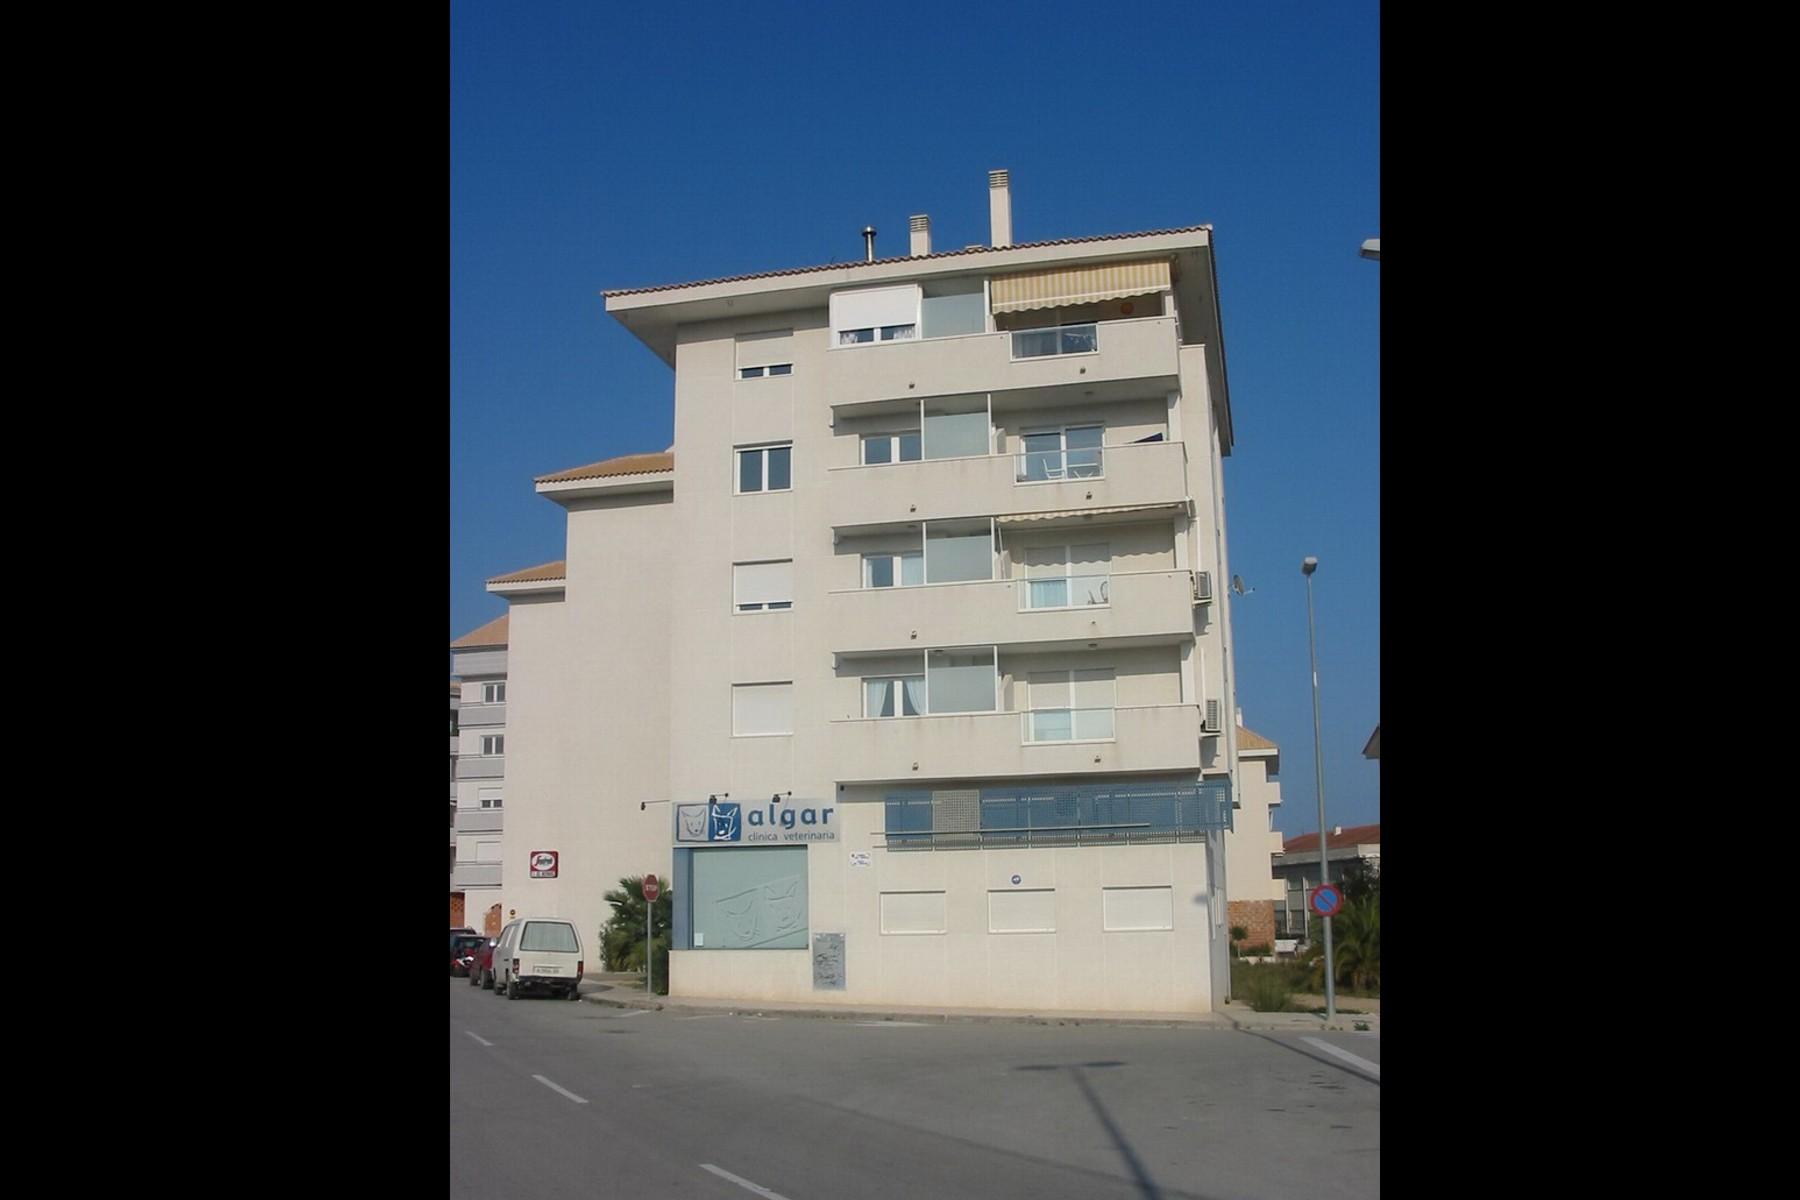 Imaginarq-053-Edificio-Viviendas-Altea-Alicante-25A